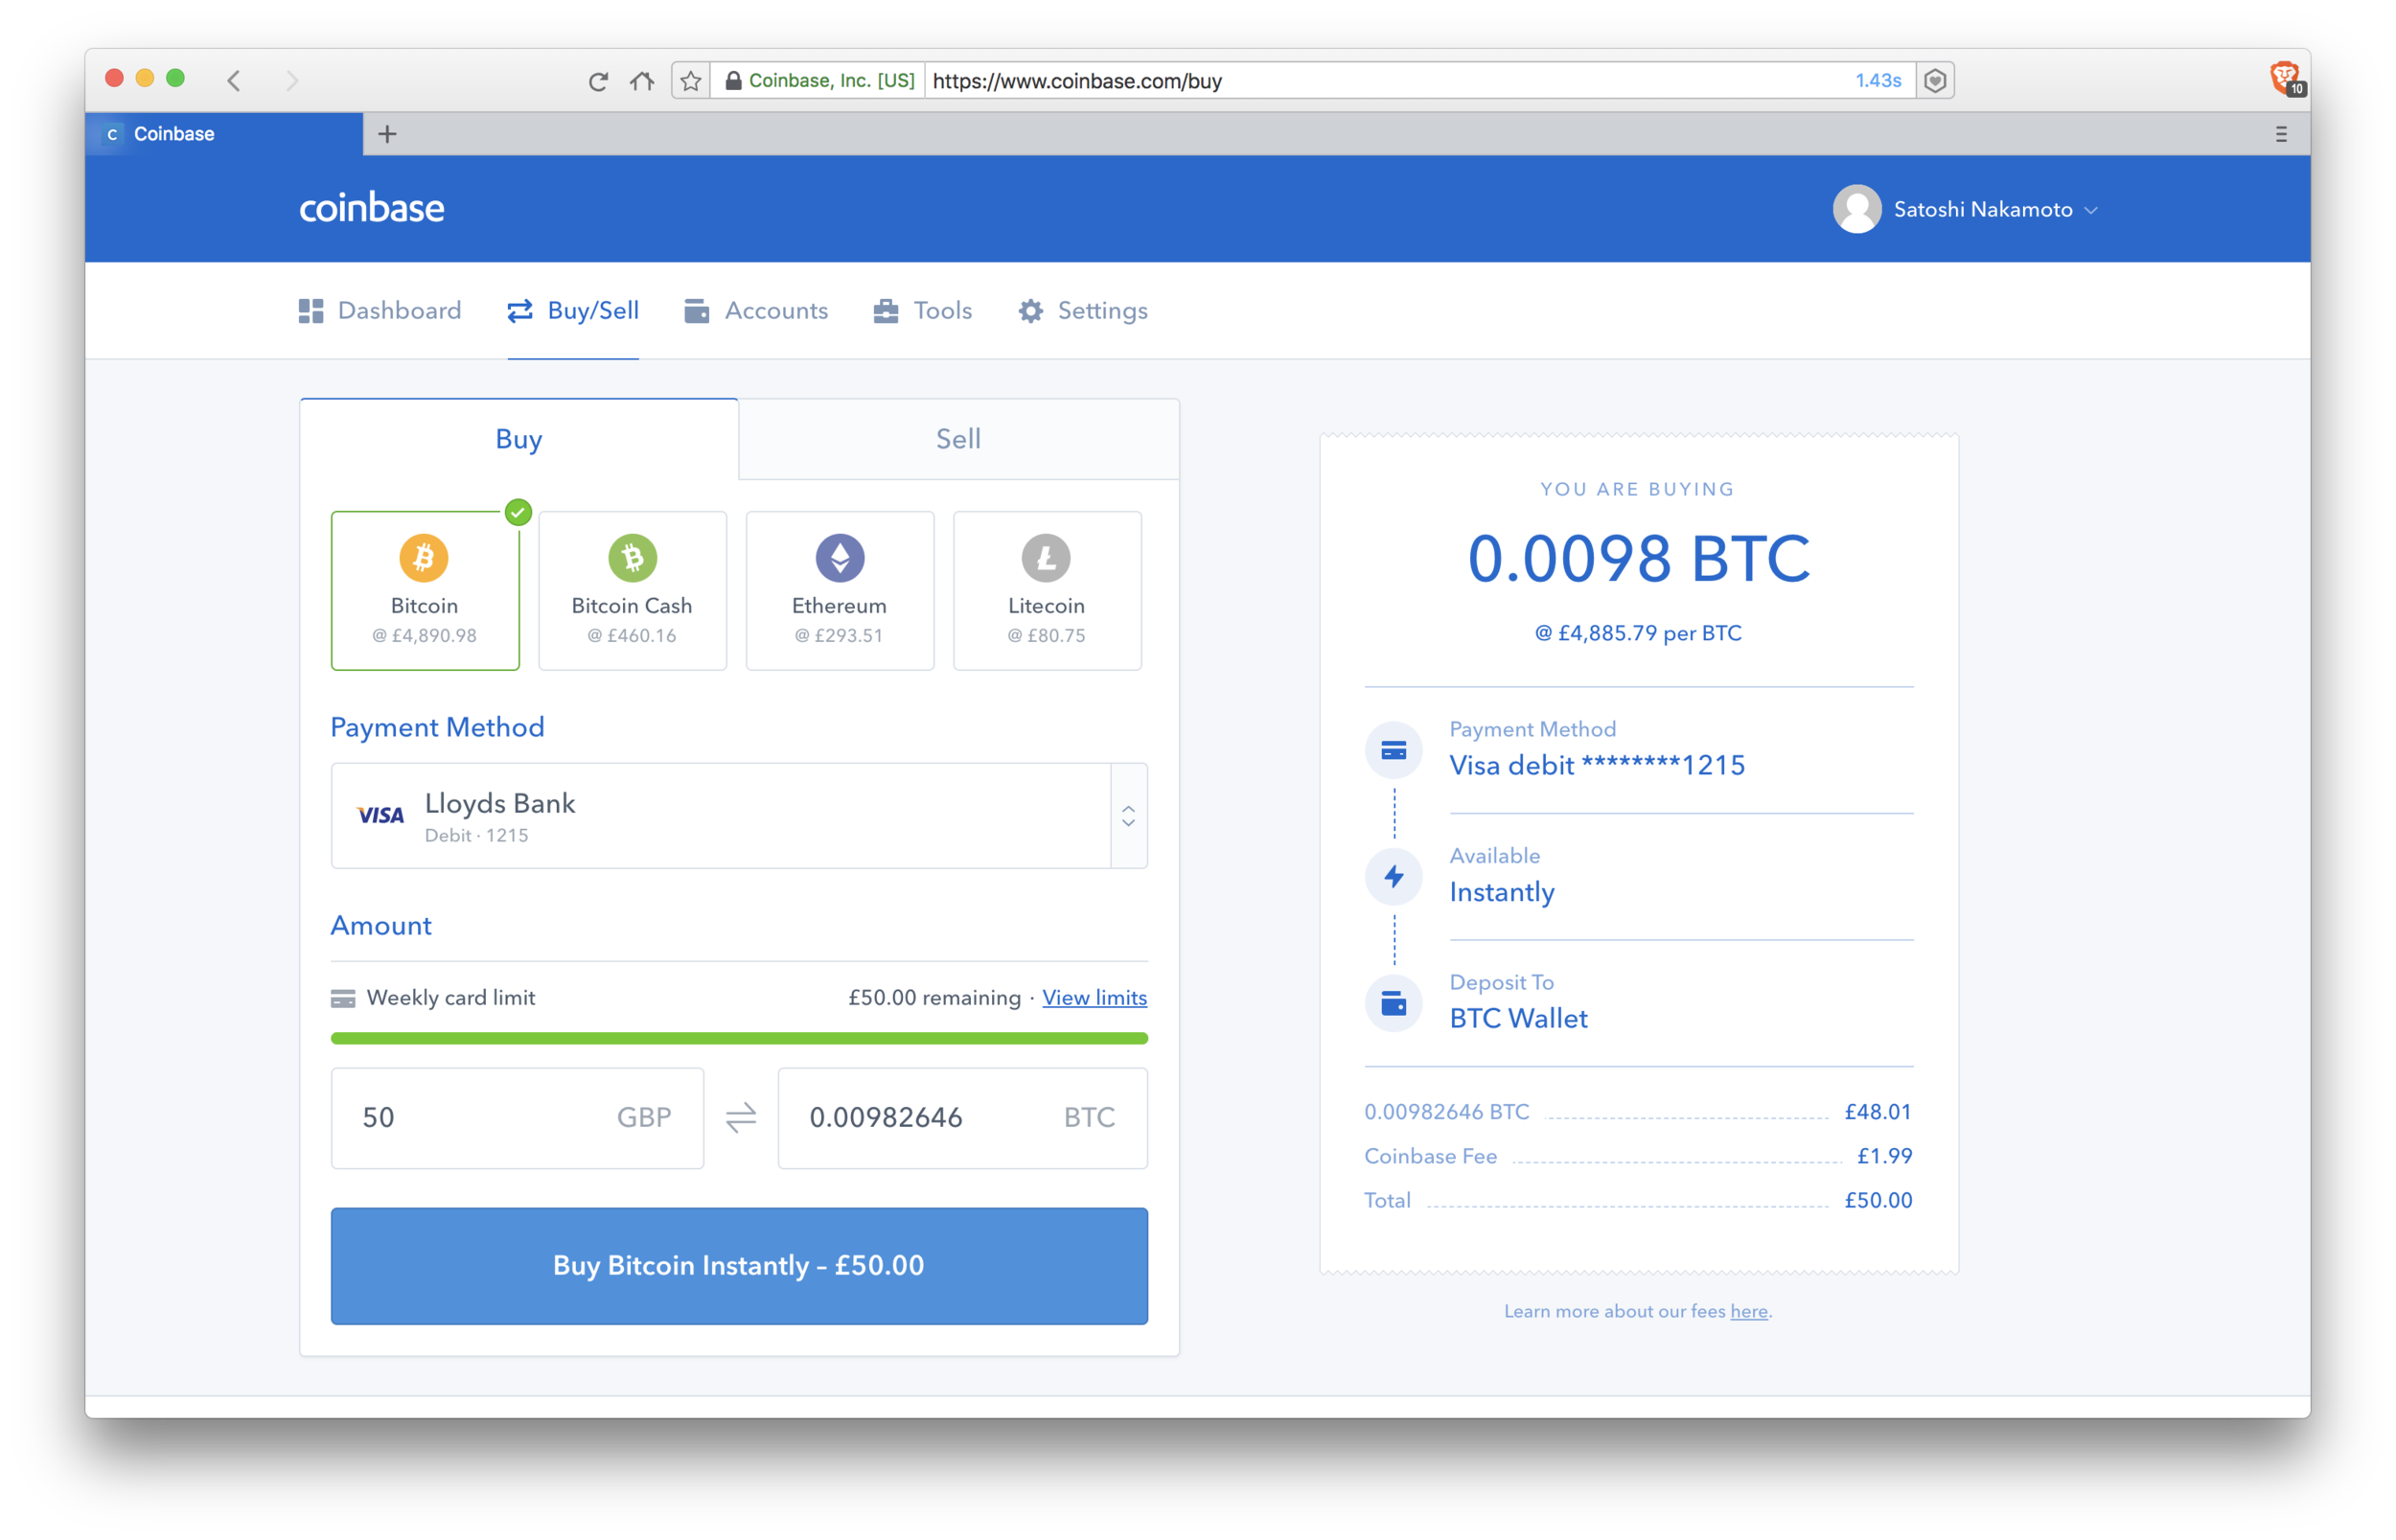 Coinbase: choosing amount to buy